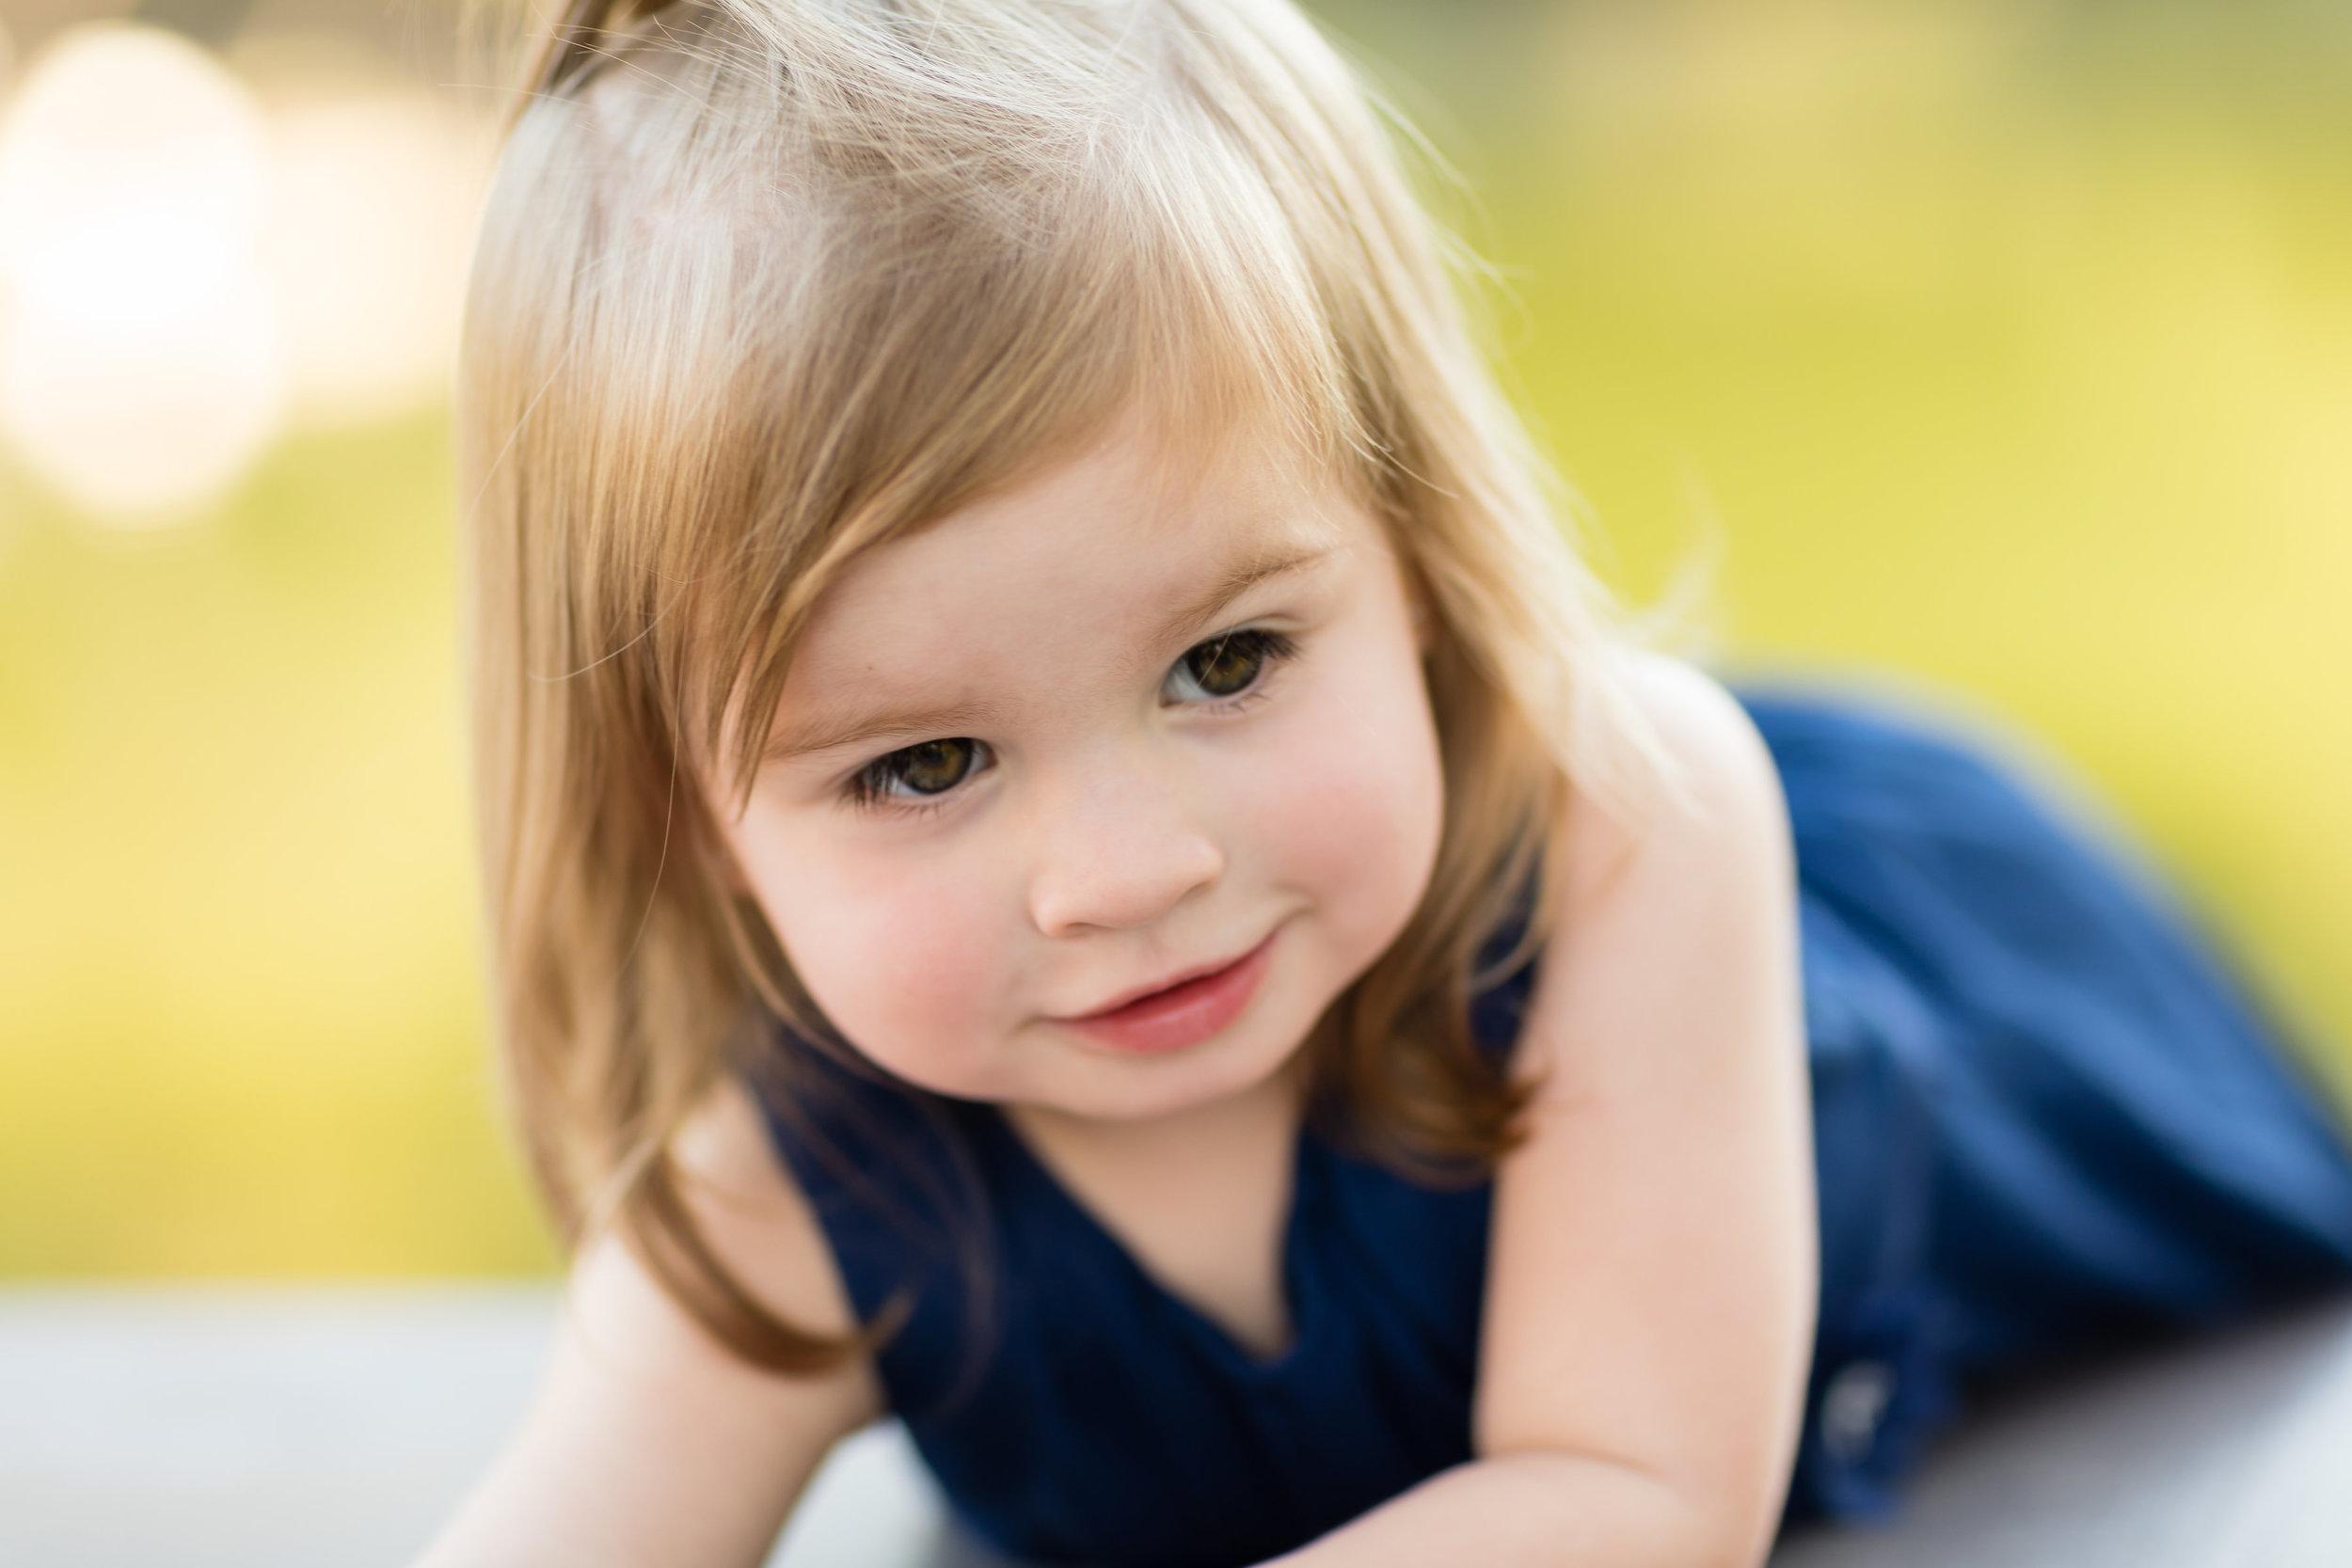 Birthday girl turns 2 portraits in the park.jpg